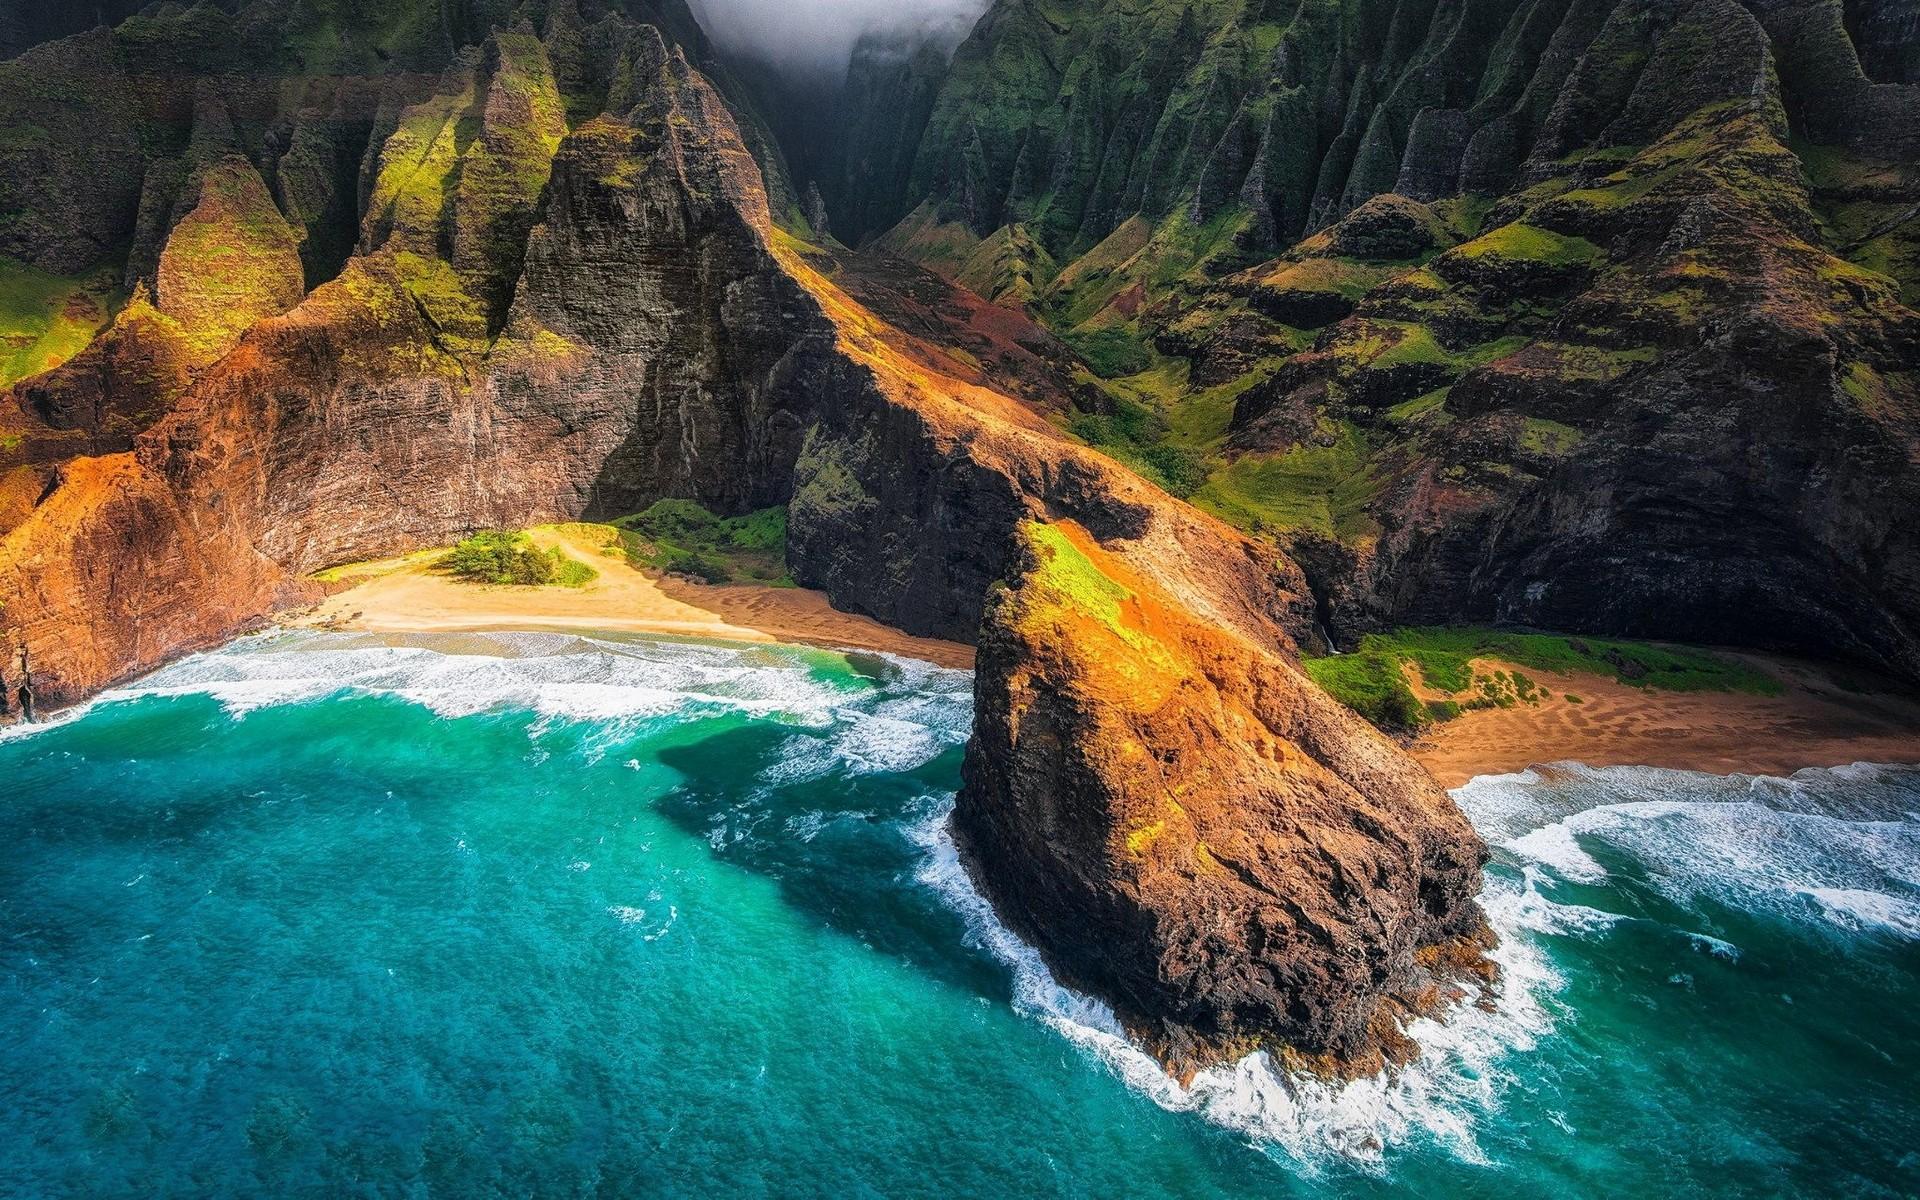 Mountain Kauai Beach Cliff Sea Sand Shrubs Aerial: Wallpaper : Landscape, Mountains, Waterfall, Sea, Nature